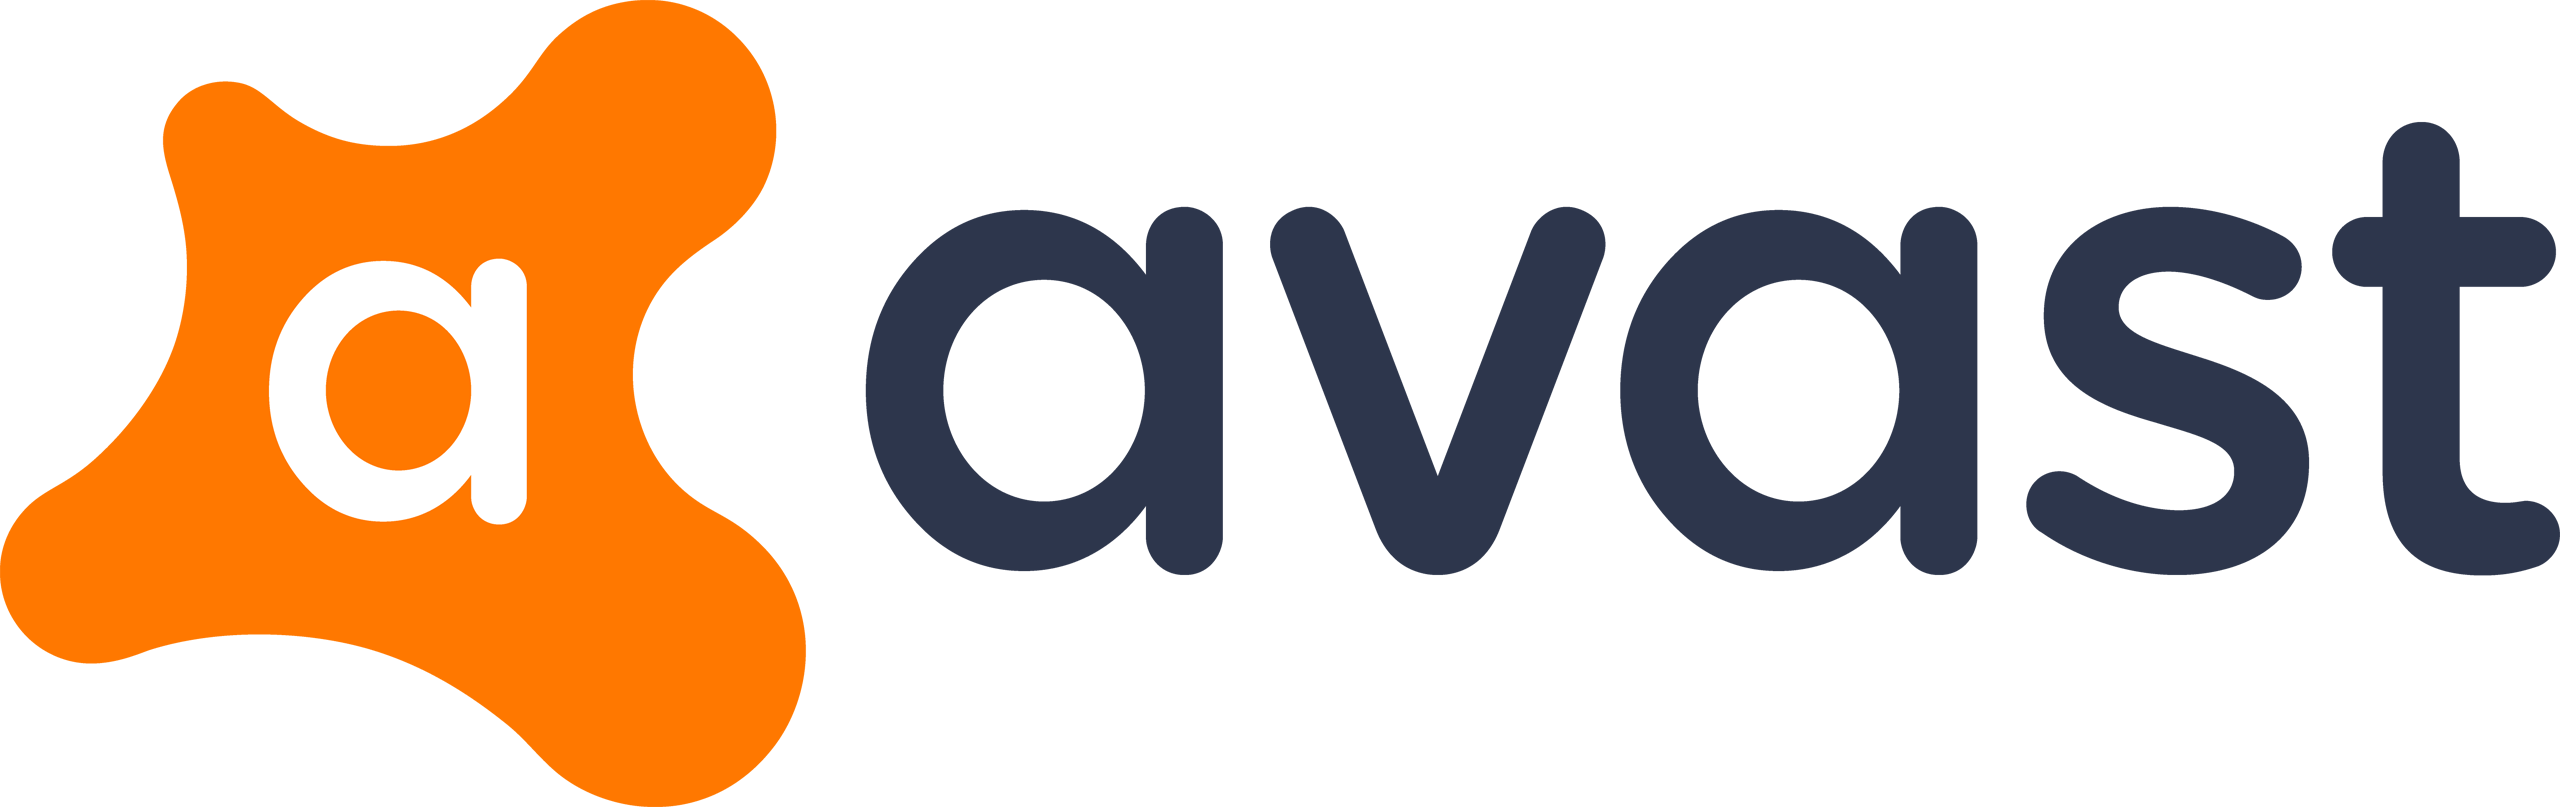 Avast logosu (RGB, PNG) PlusPng.com  - Avast Logo PNG